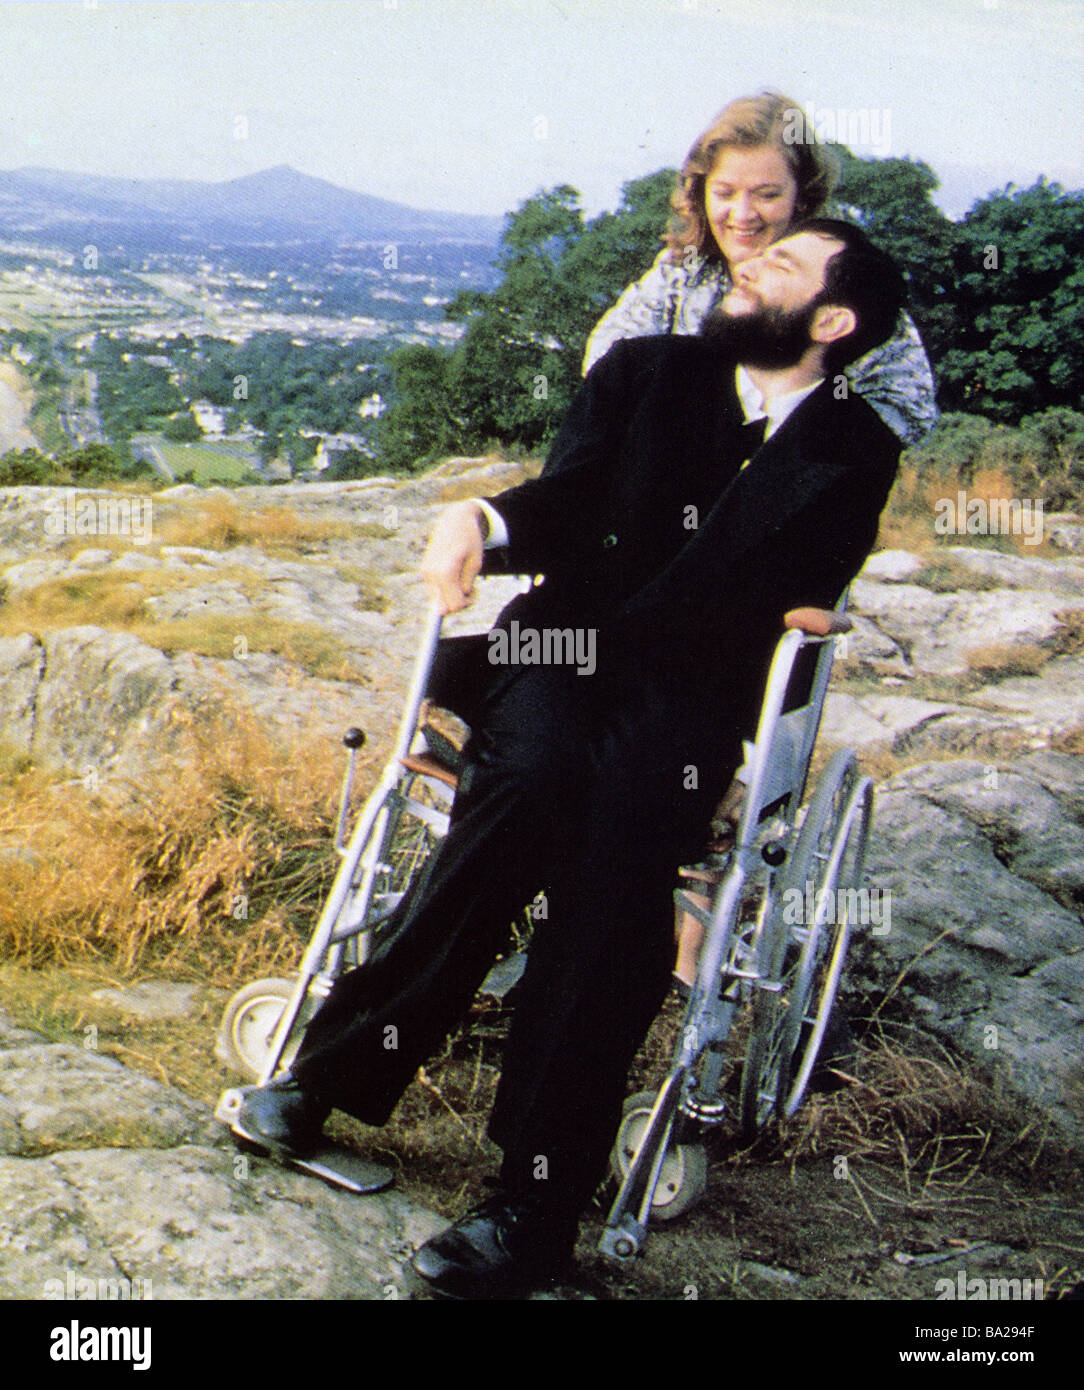 mon-pied-gauche-1989-palace-film-avec-daniel-day-lewis-et-brenda-fricker-ba294f